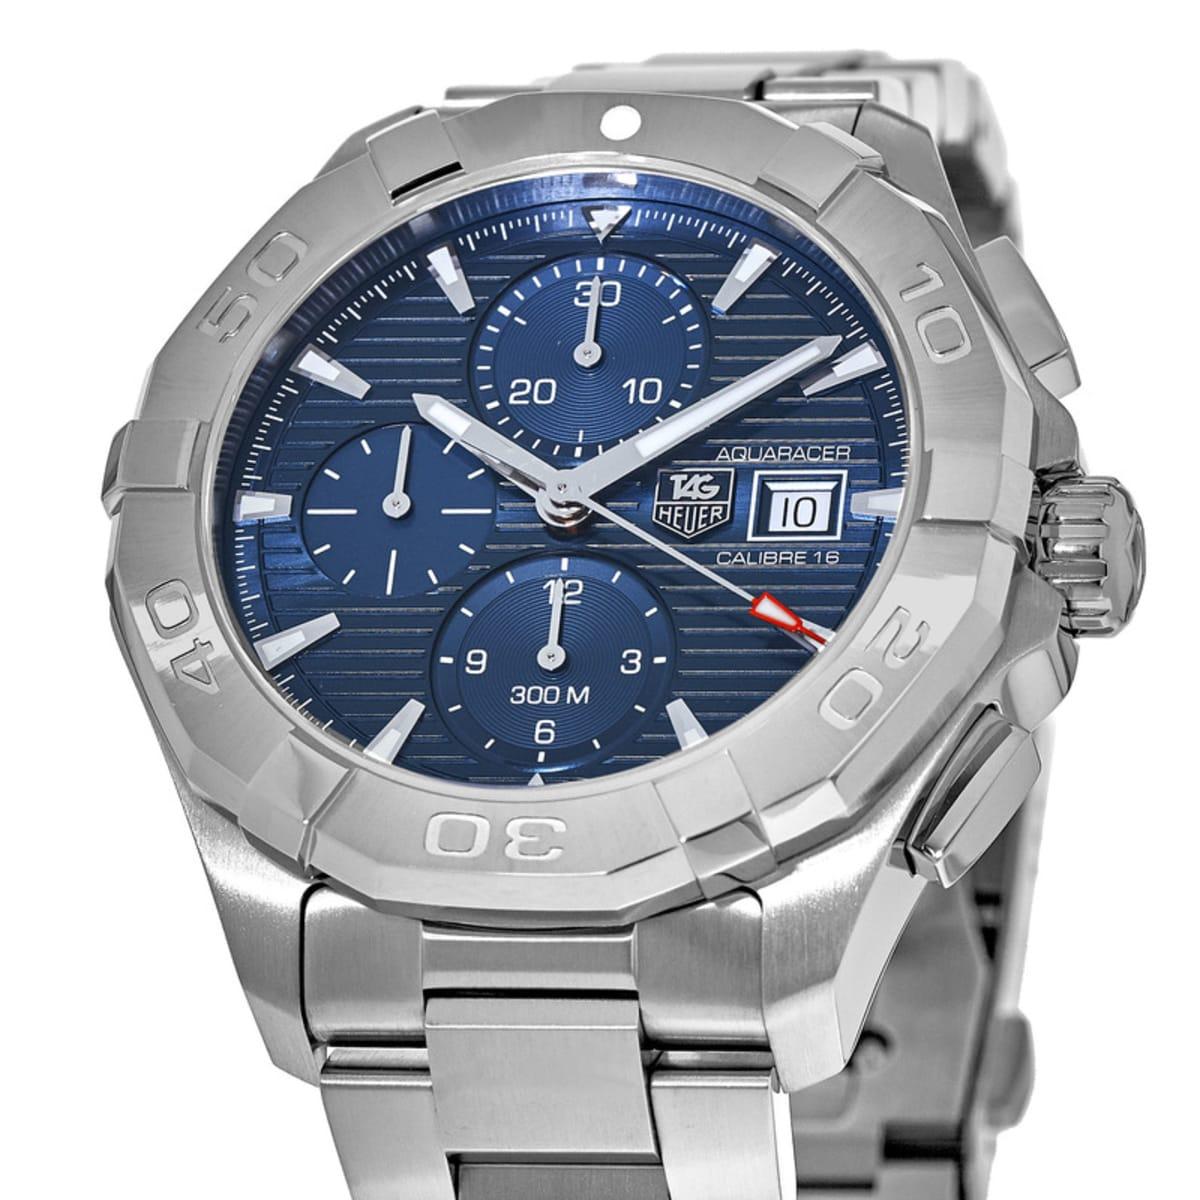 online retailer 6a1d4 667ce Tag Heuer Aquaracer 300M Automatic Chronograph Men's Watch CAY2112.BA0925